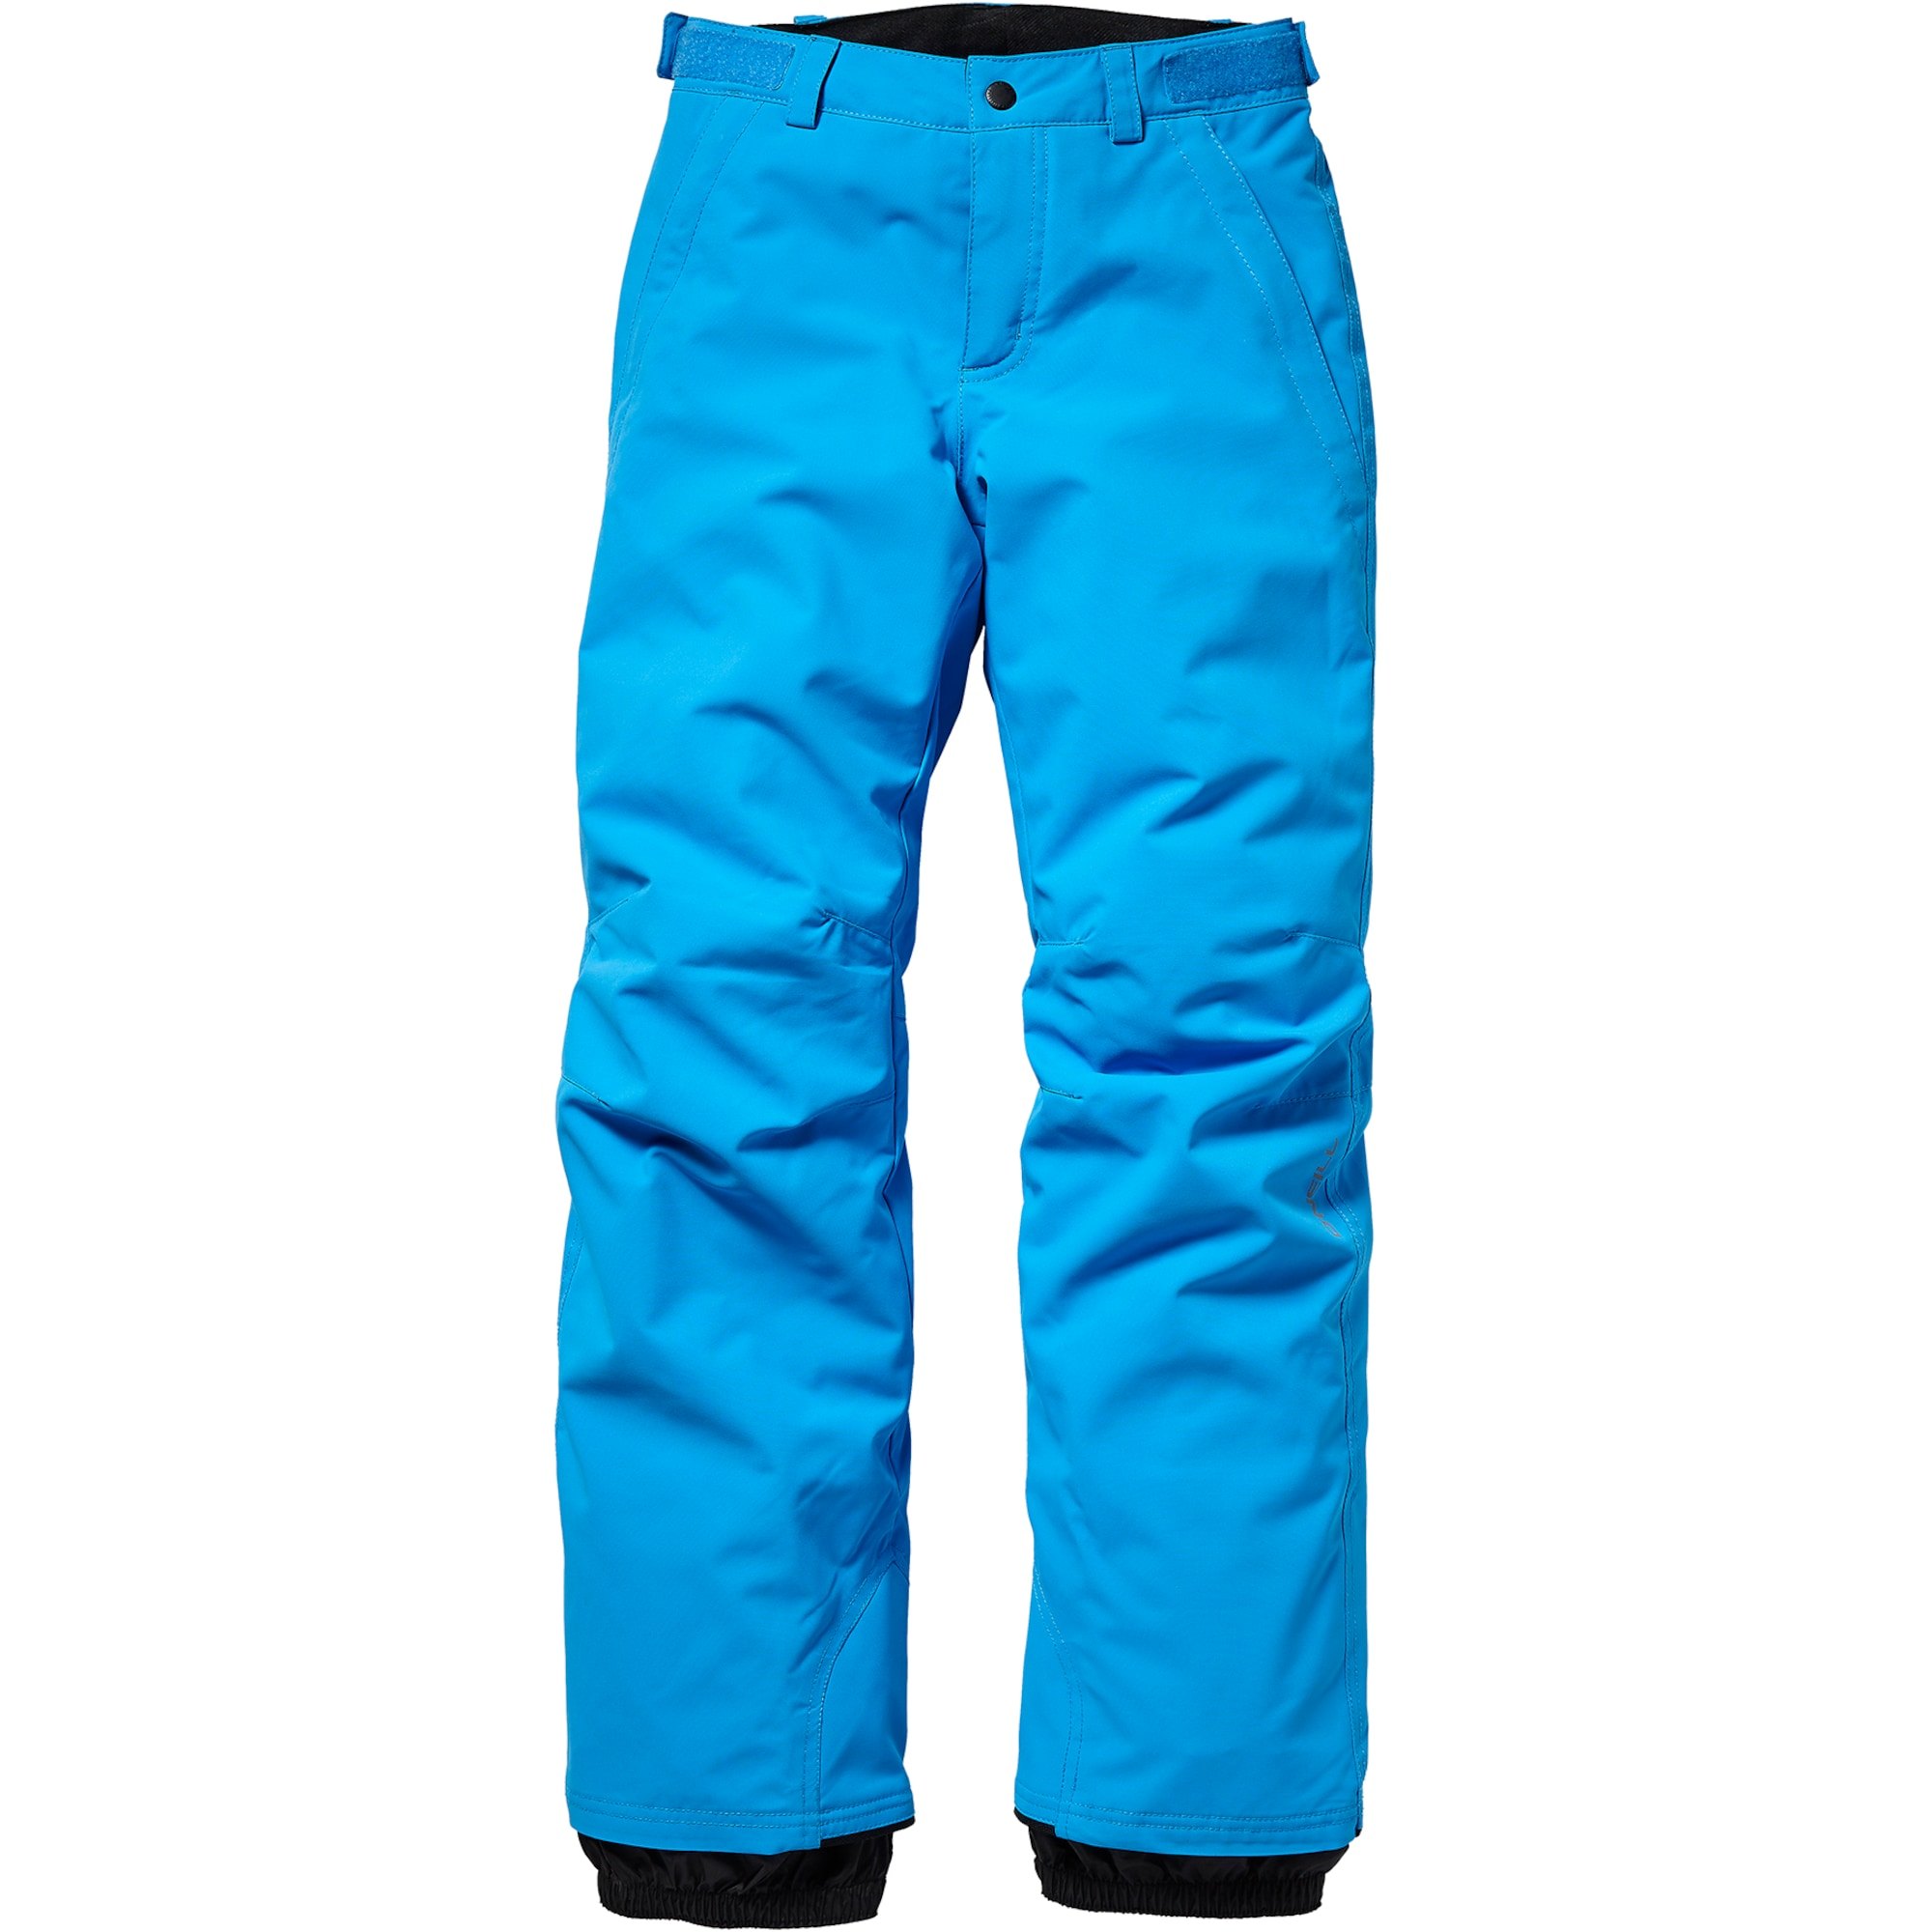 ONEILL Outodoor kalhoty PB ANVIL PANTS modrá O'NEILL